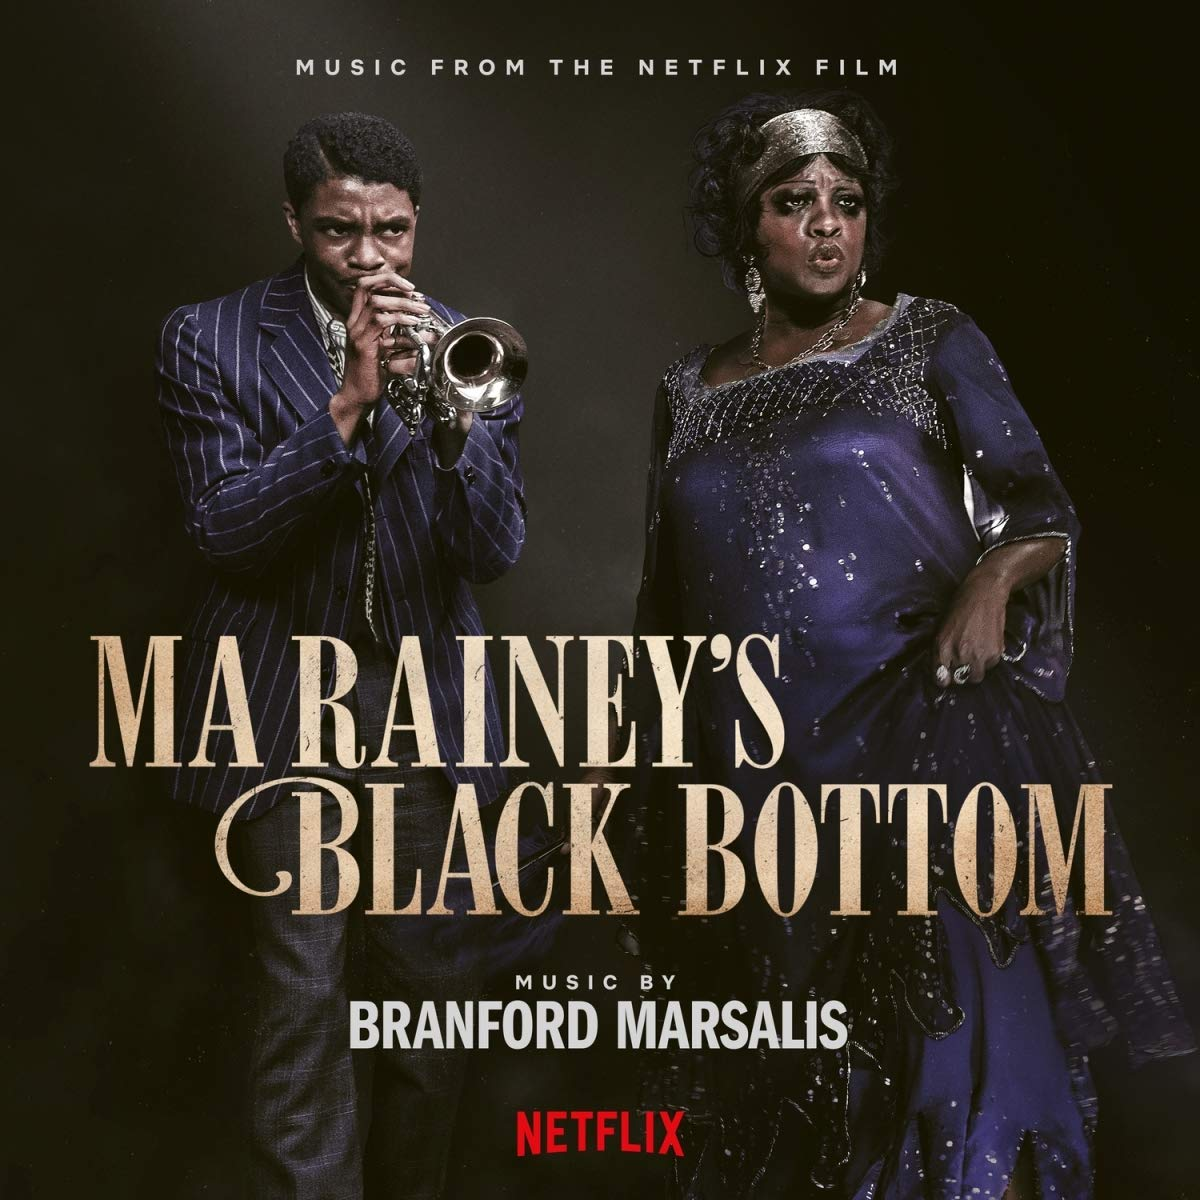 Branford Marsalis: Ma Rainey's Black Bottom (Music from the Netflix Film)